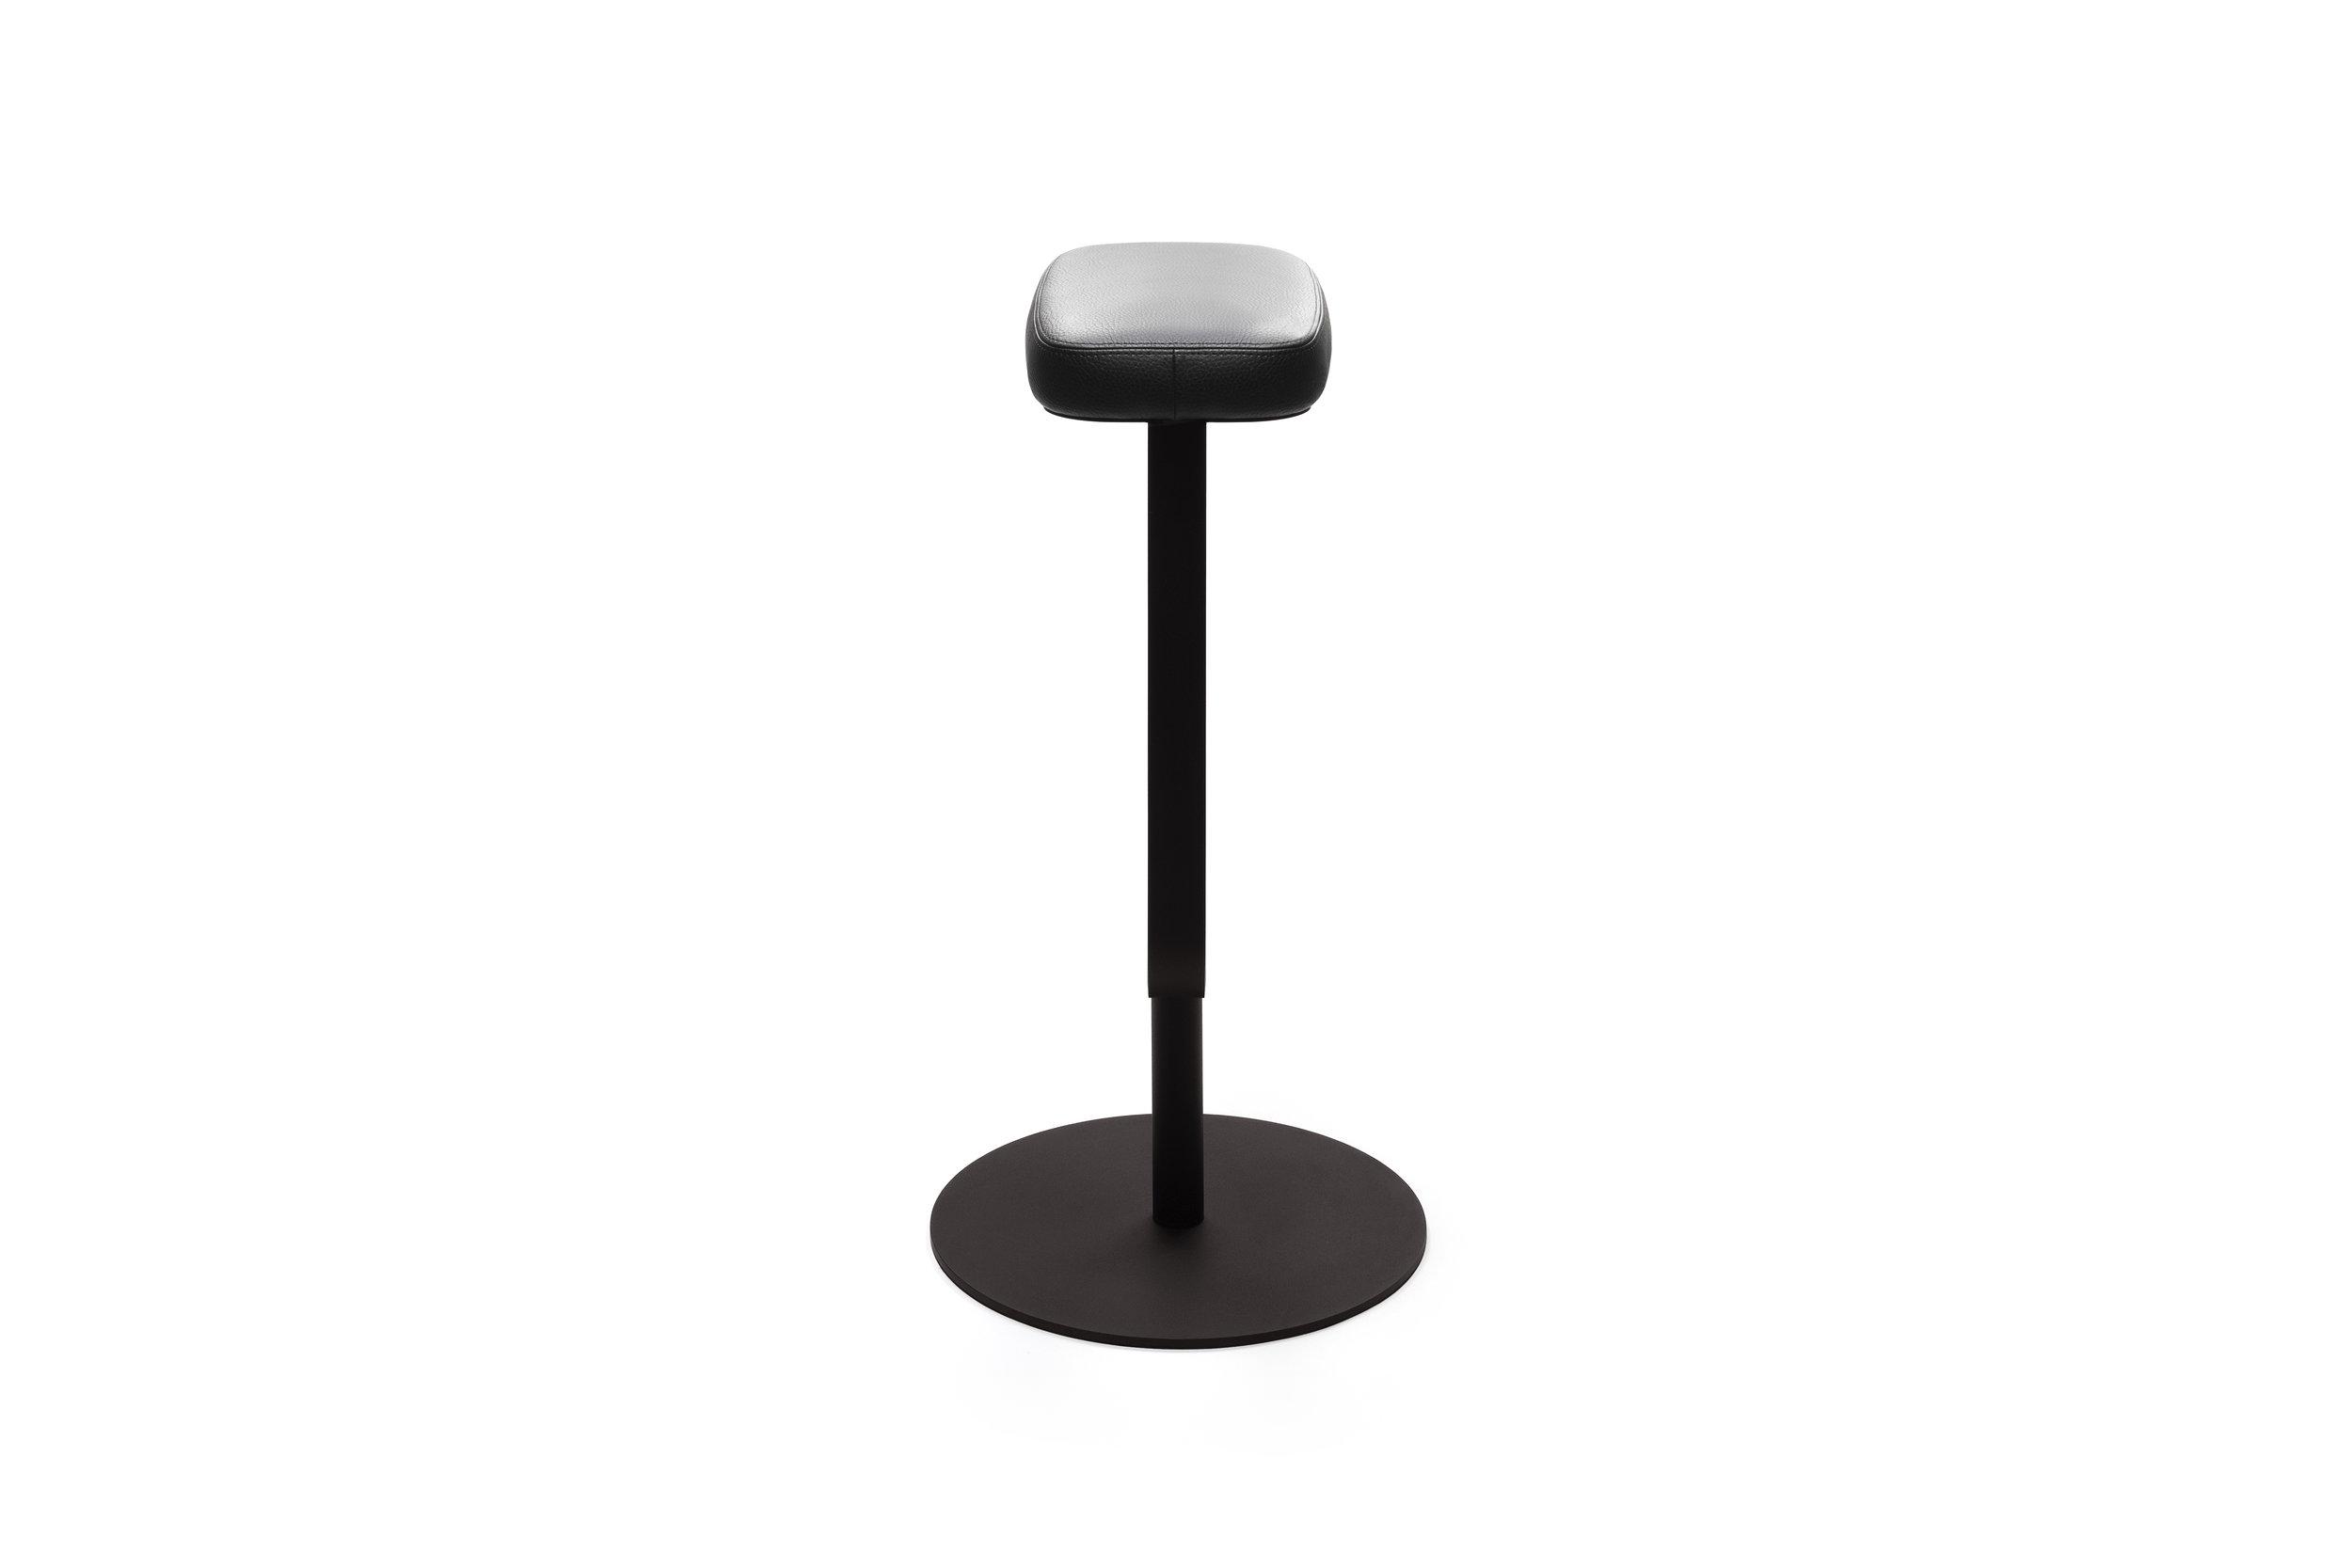 OBJEKTEN_Slim_Bar stool_AlainBerteau_1.jpg